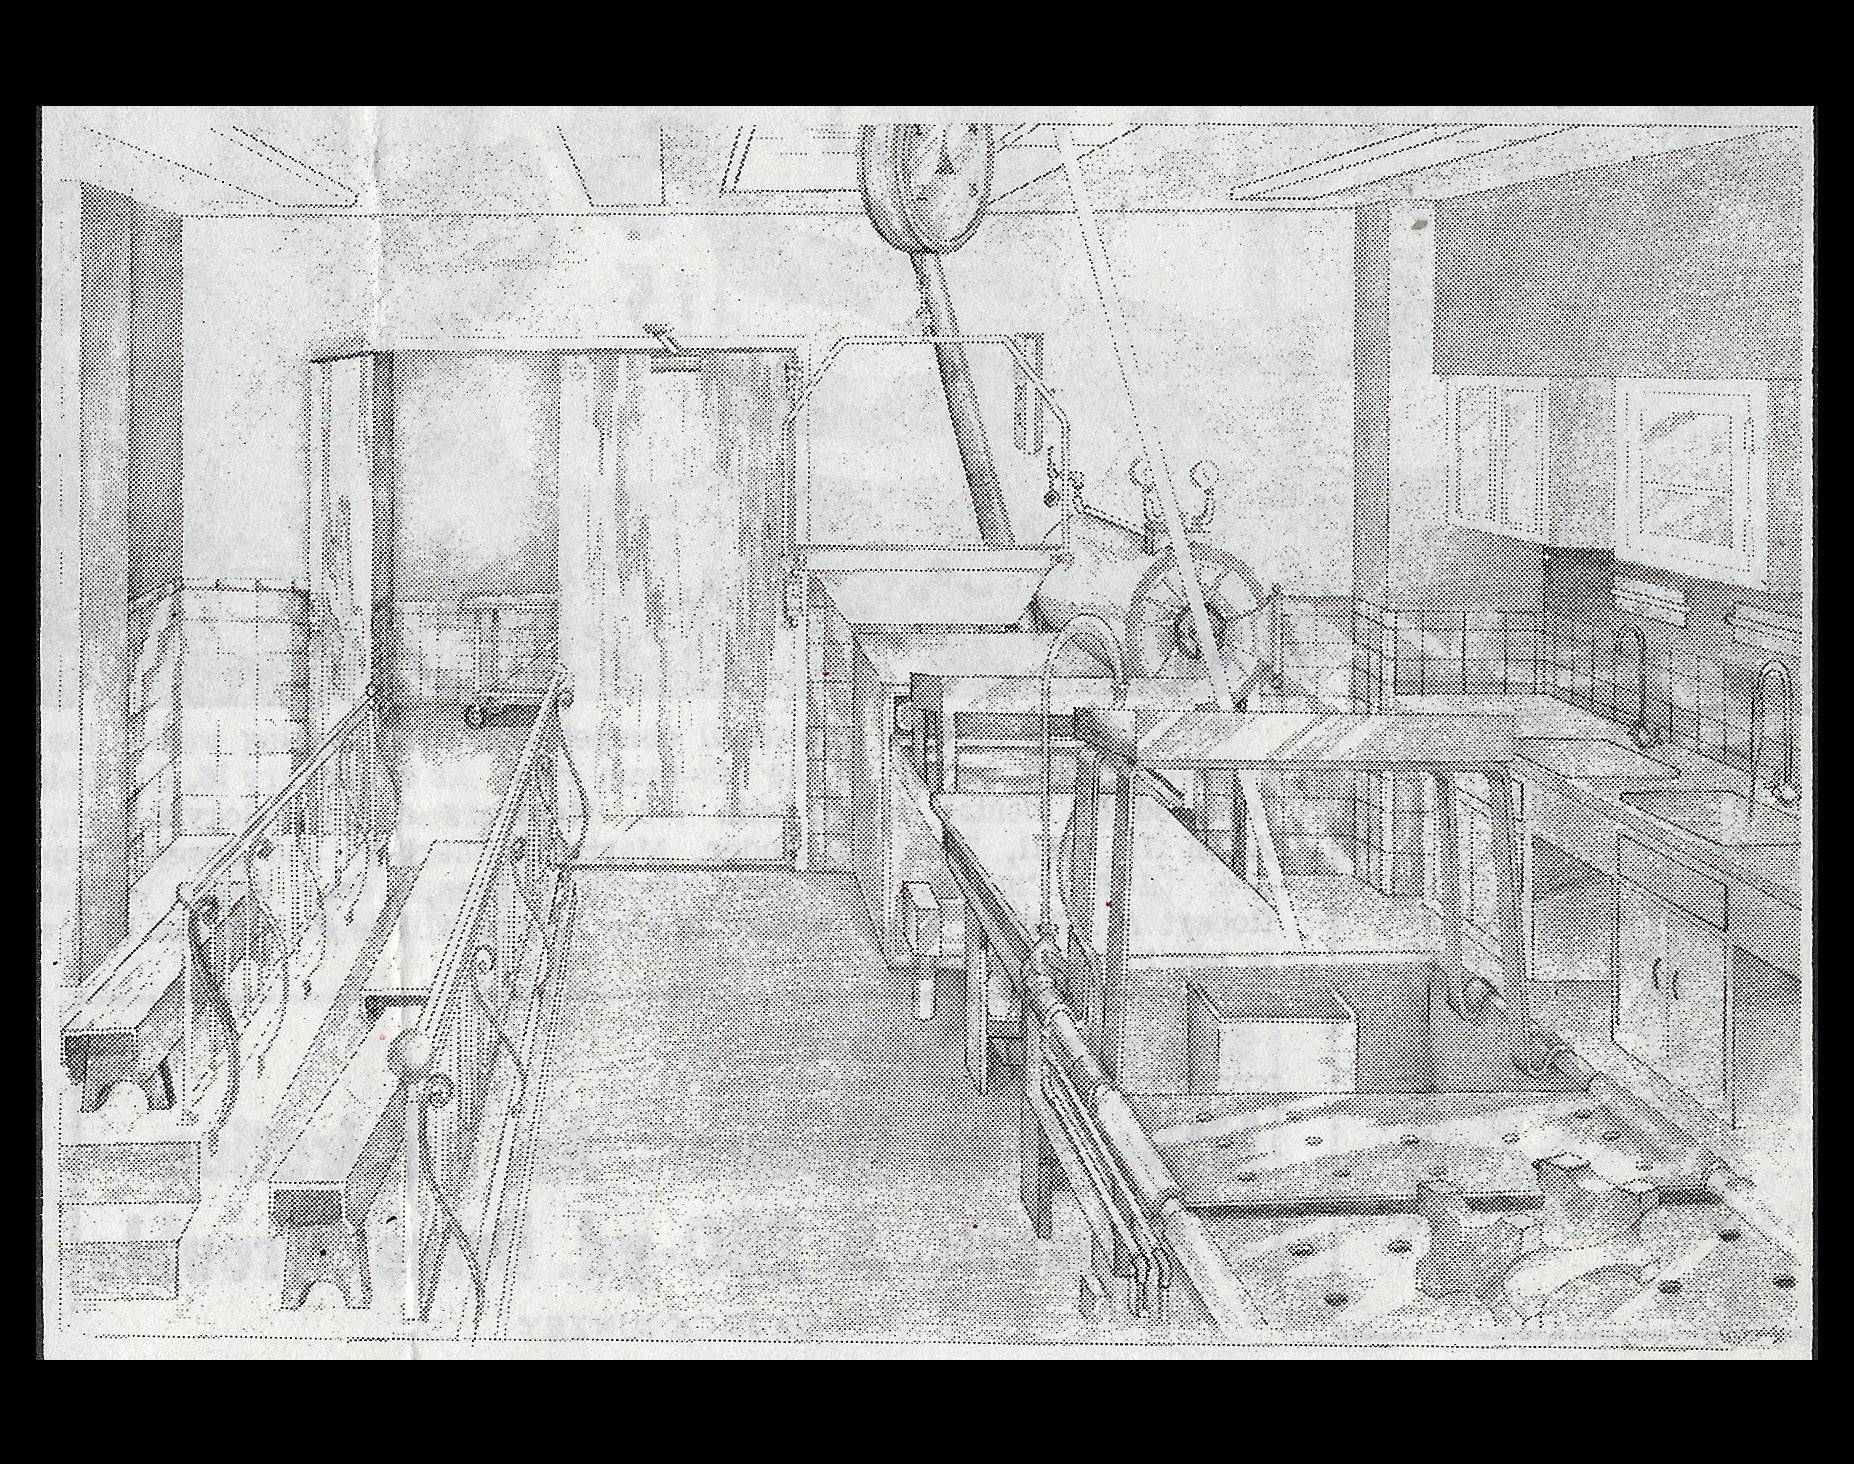 Bethesda-Hospital-Morgue-drawn-by-Lee-Wa